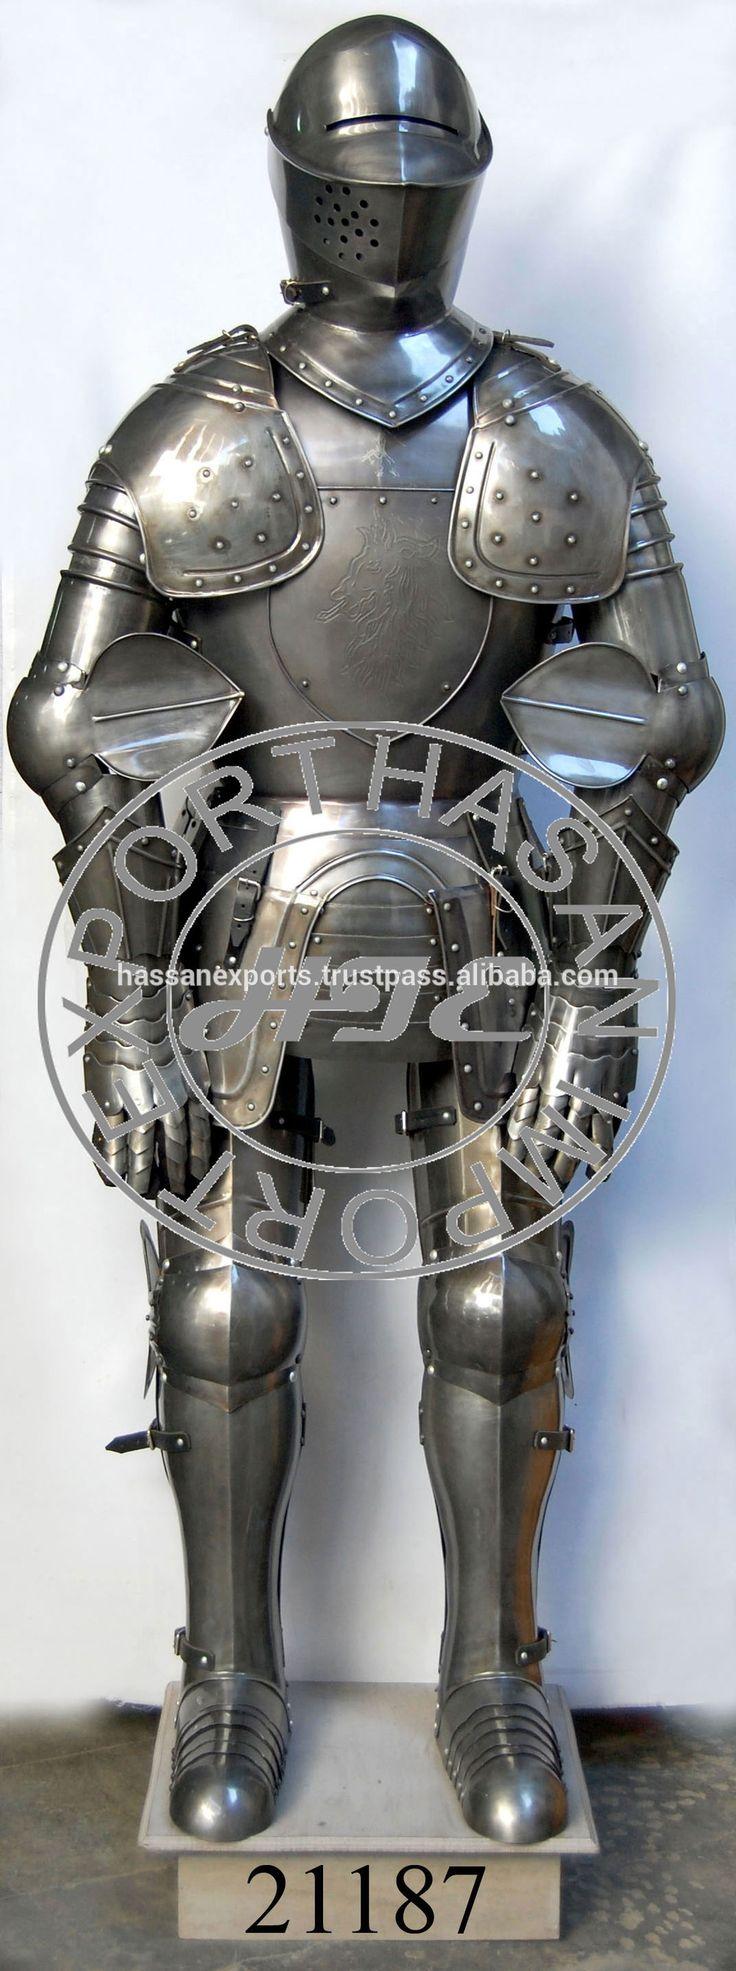 Decorative Royal Design Medieval Knight Full Body Armor, Wearable Body Armor